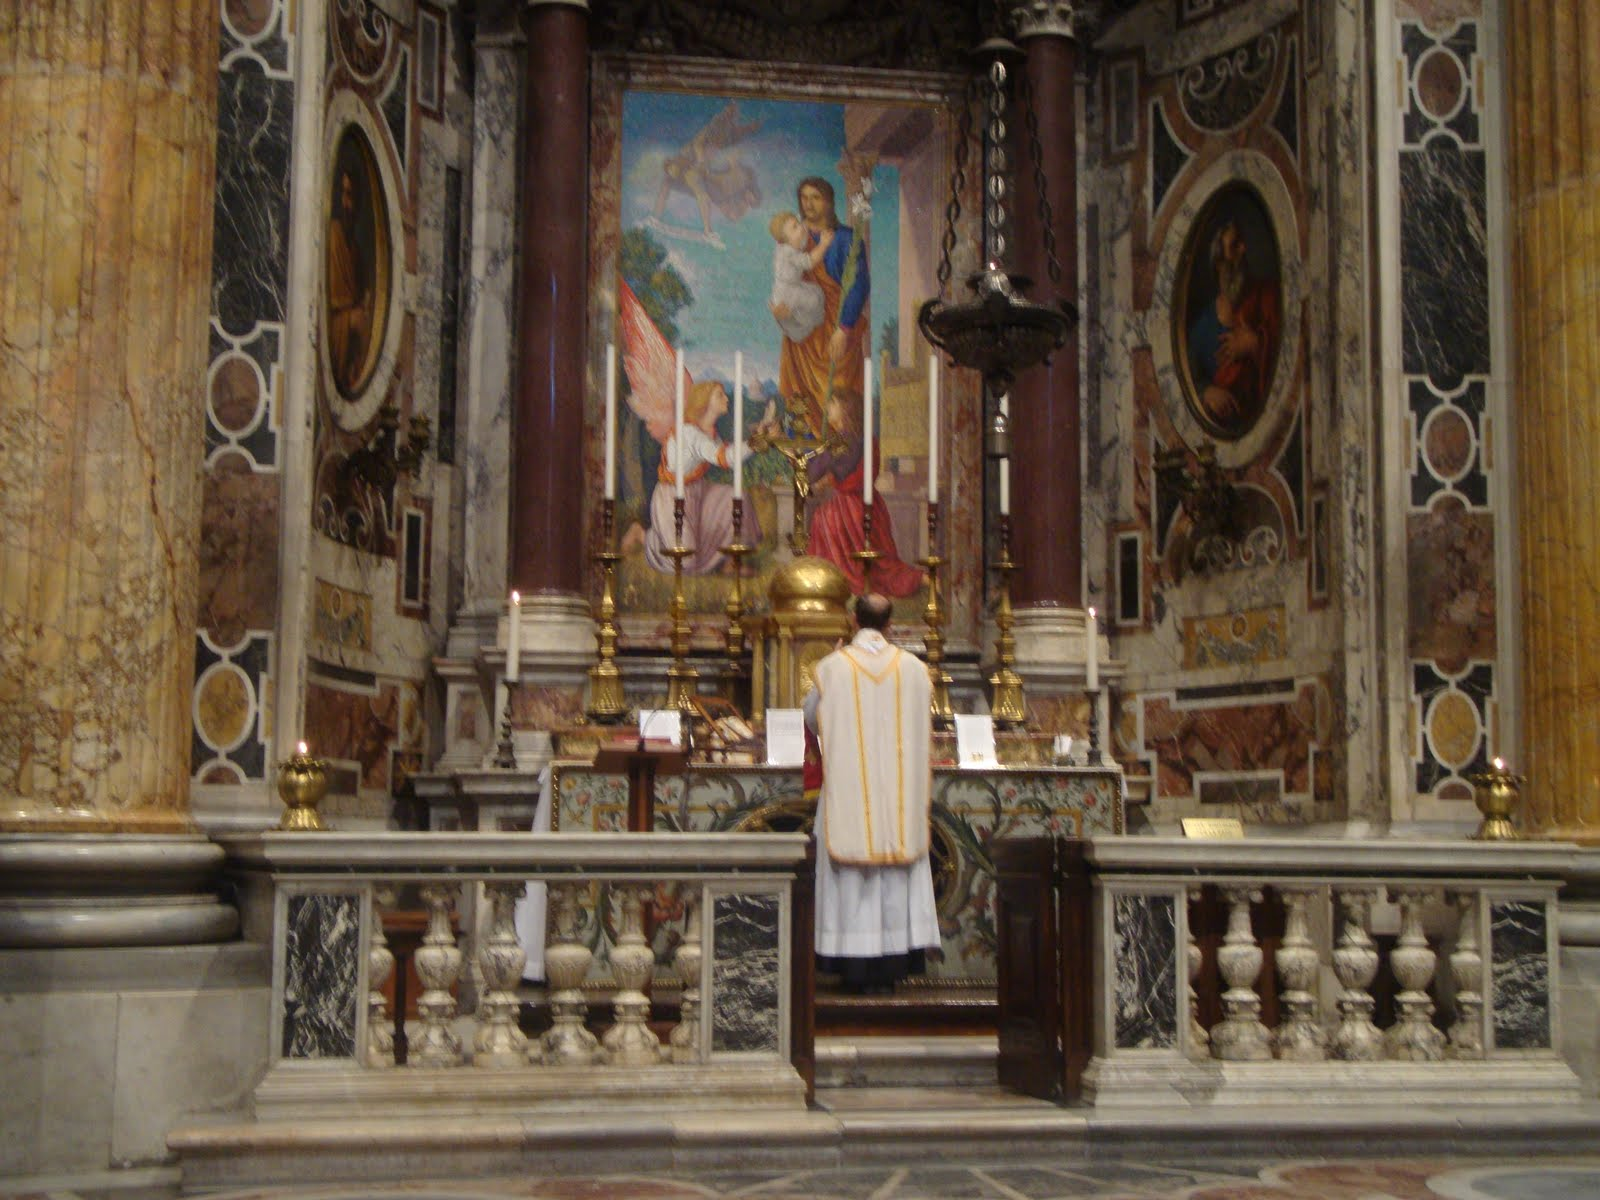 Celebrating Home Decor A Catholic Life Latin Mass On The Altar Of St Joseph Of